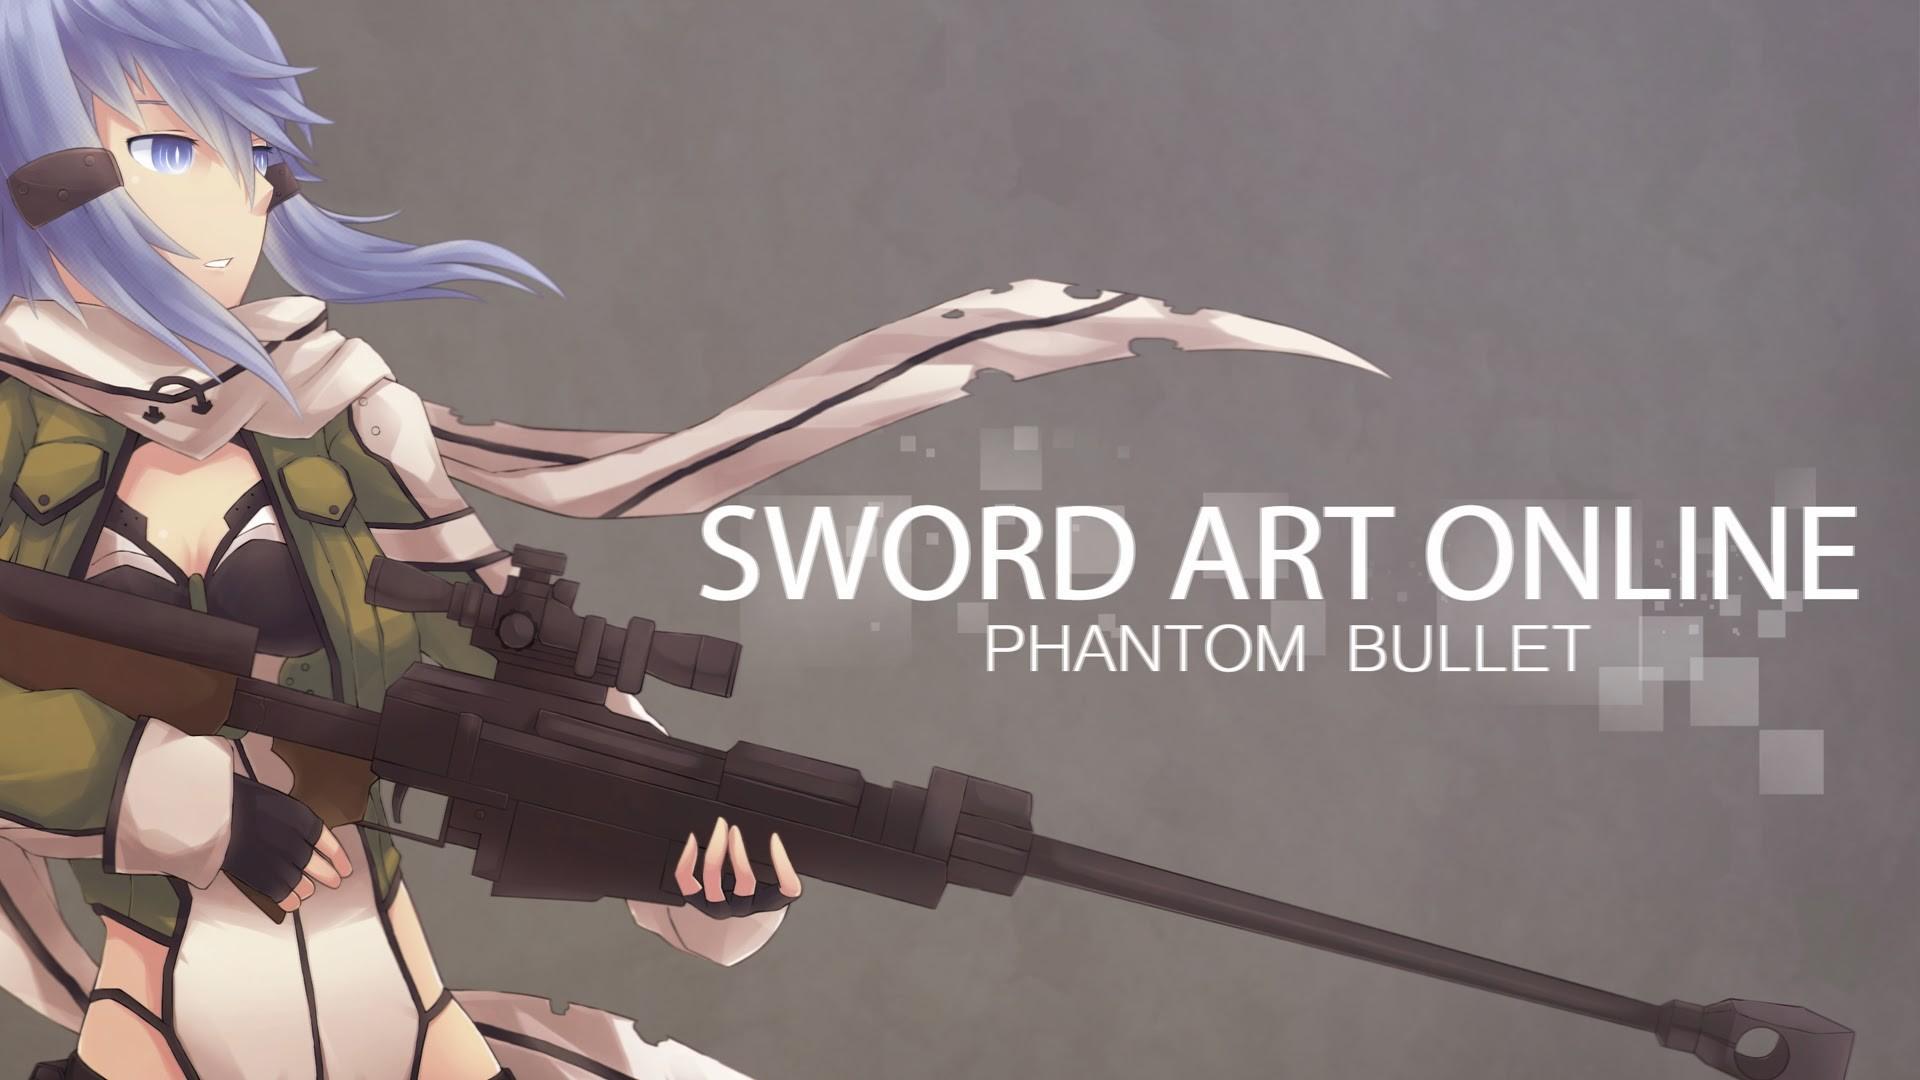 phantom bullet gun gale online anime 2014 SAO 2 GGO hd wallpaper .